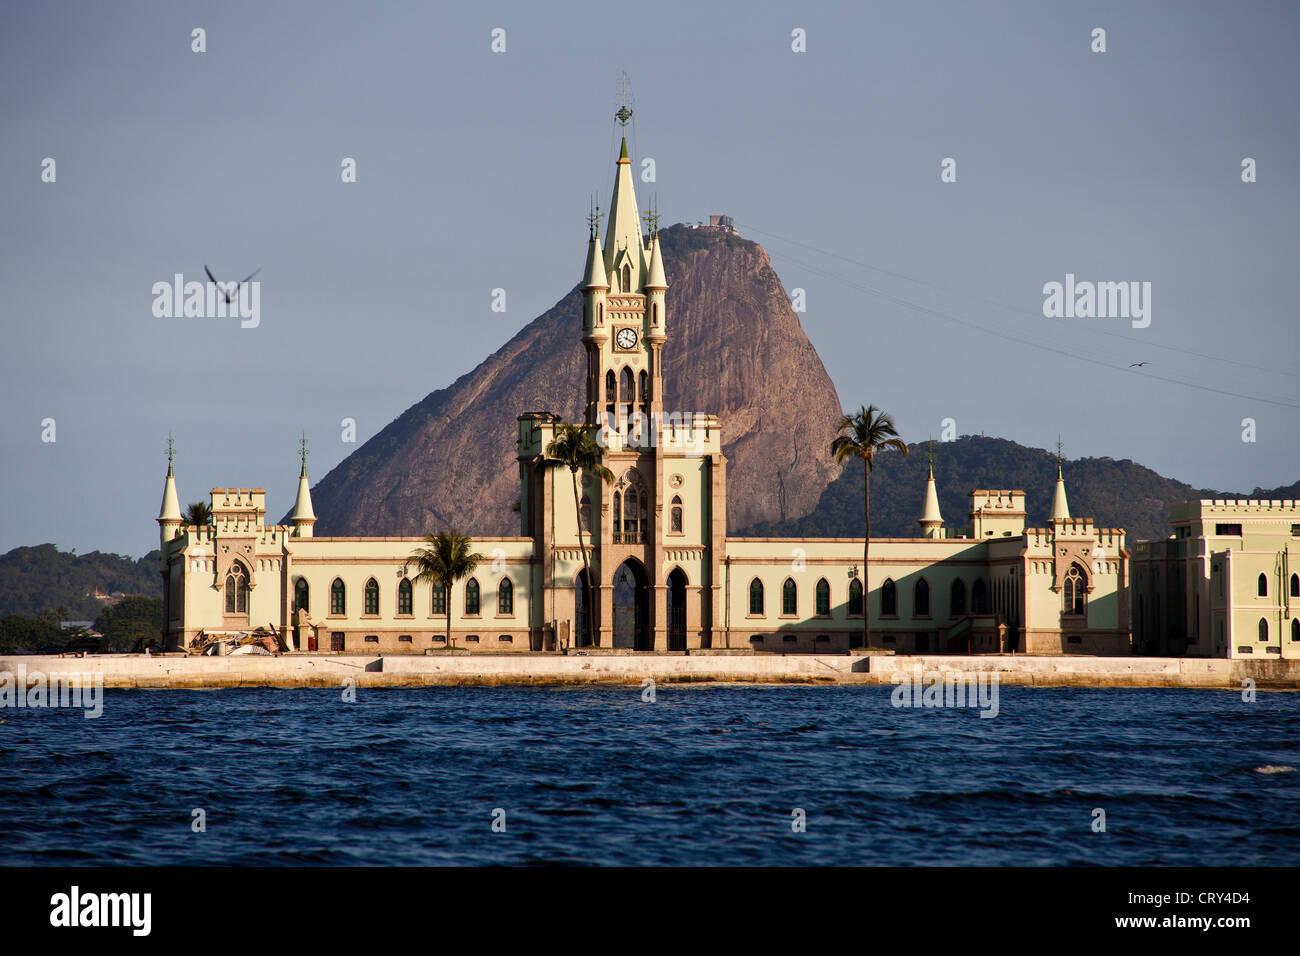 Ilha fiscale, isola situata all'interno di Baia Guanabara, vicino a Sugar Loaf, Rio de Janeiro, Brasile. Immagini Stock